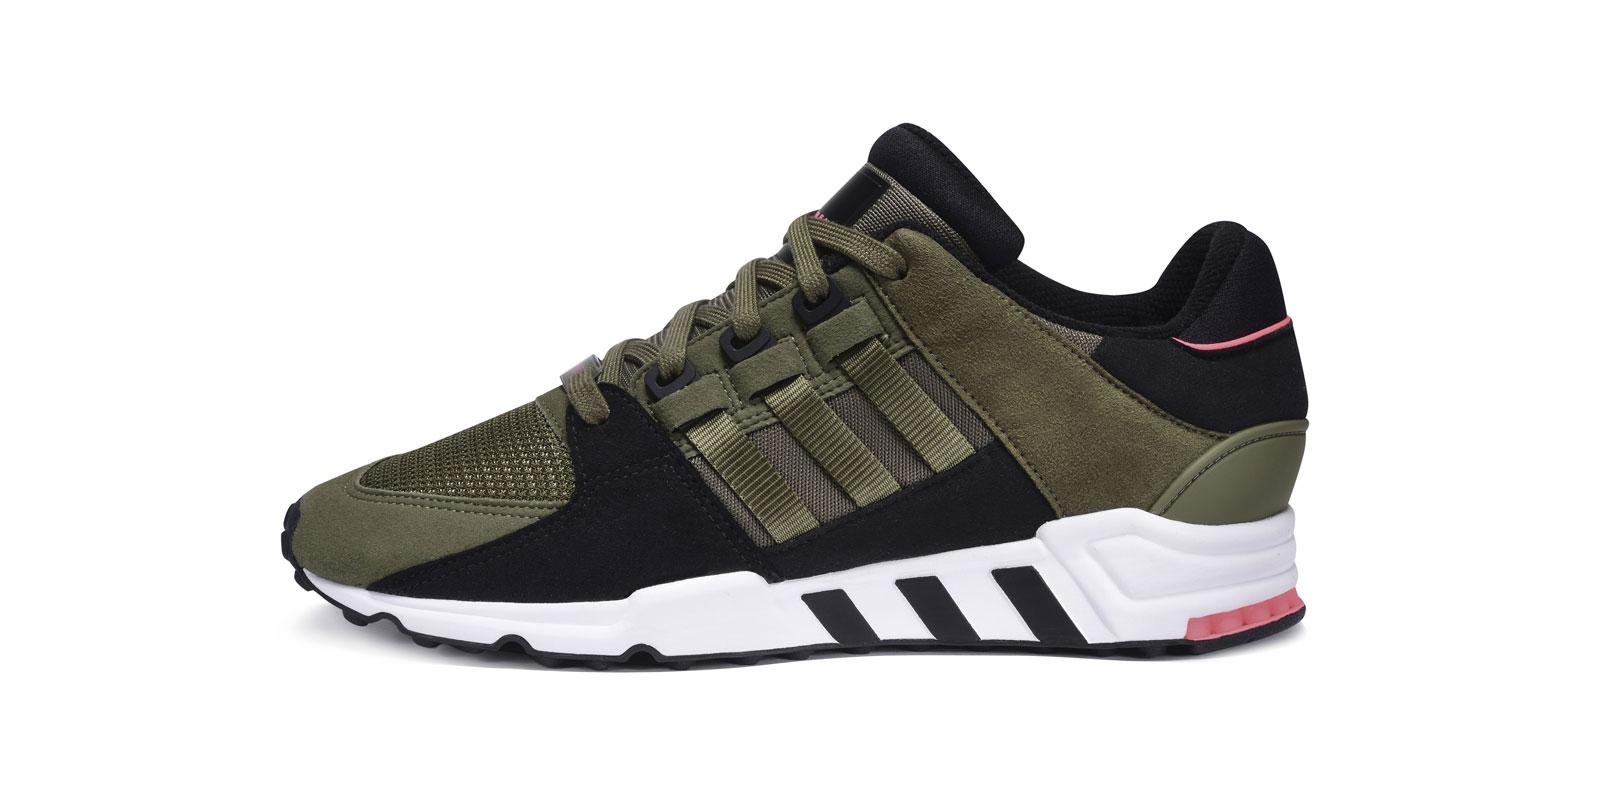 High_1600_800@x3_0019_adidas-EQT-Support-Olive-CRG-Black